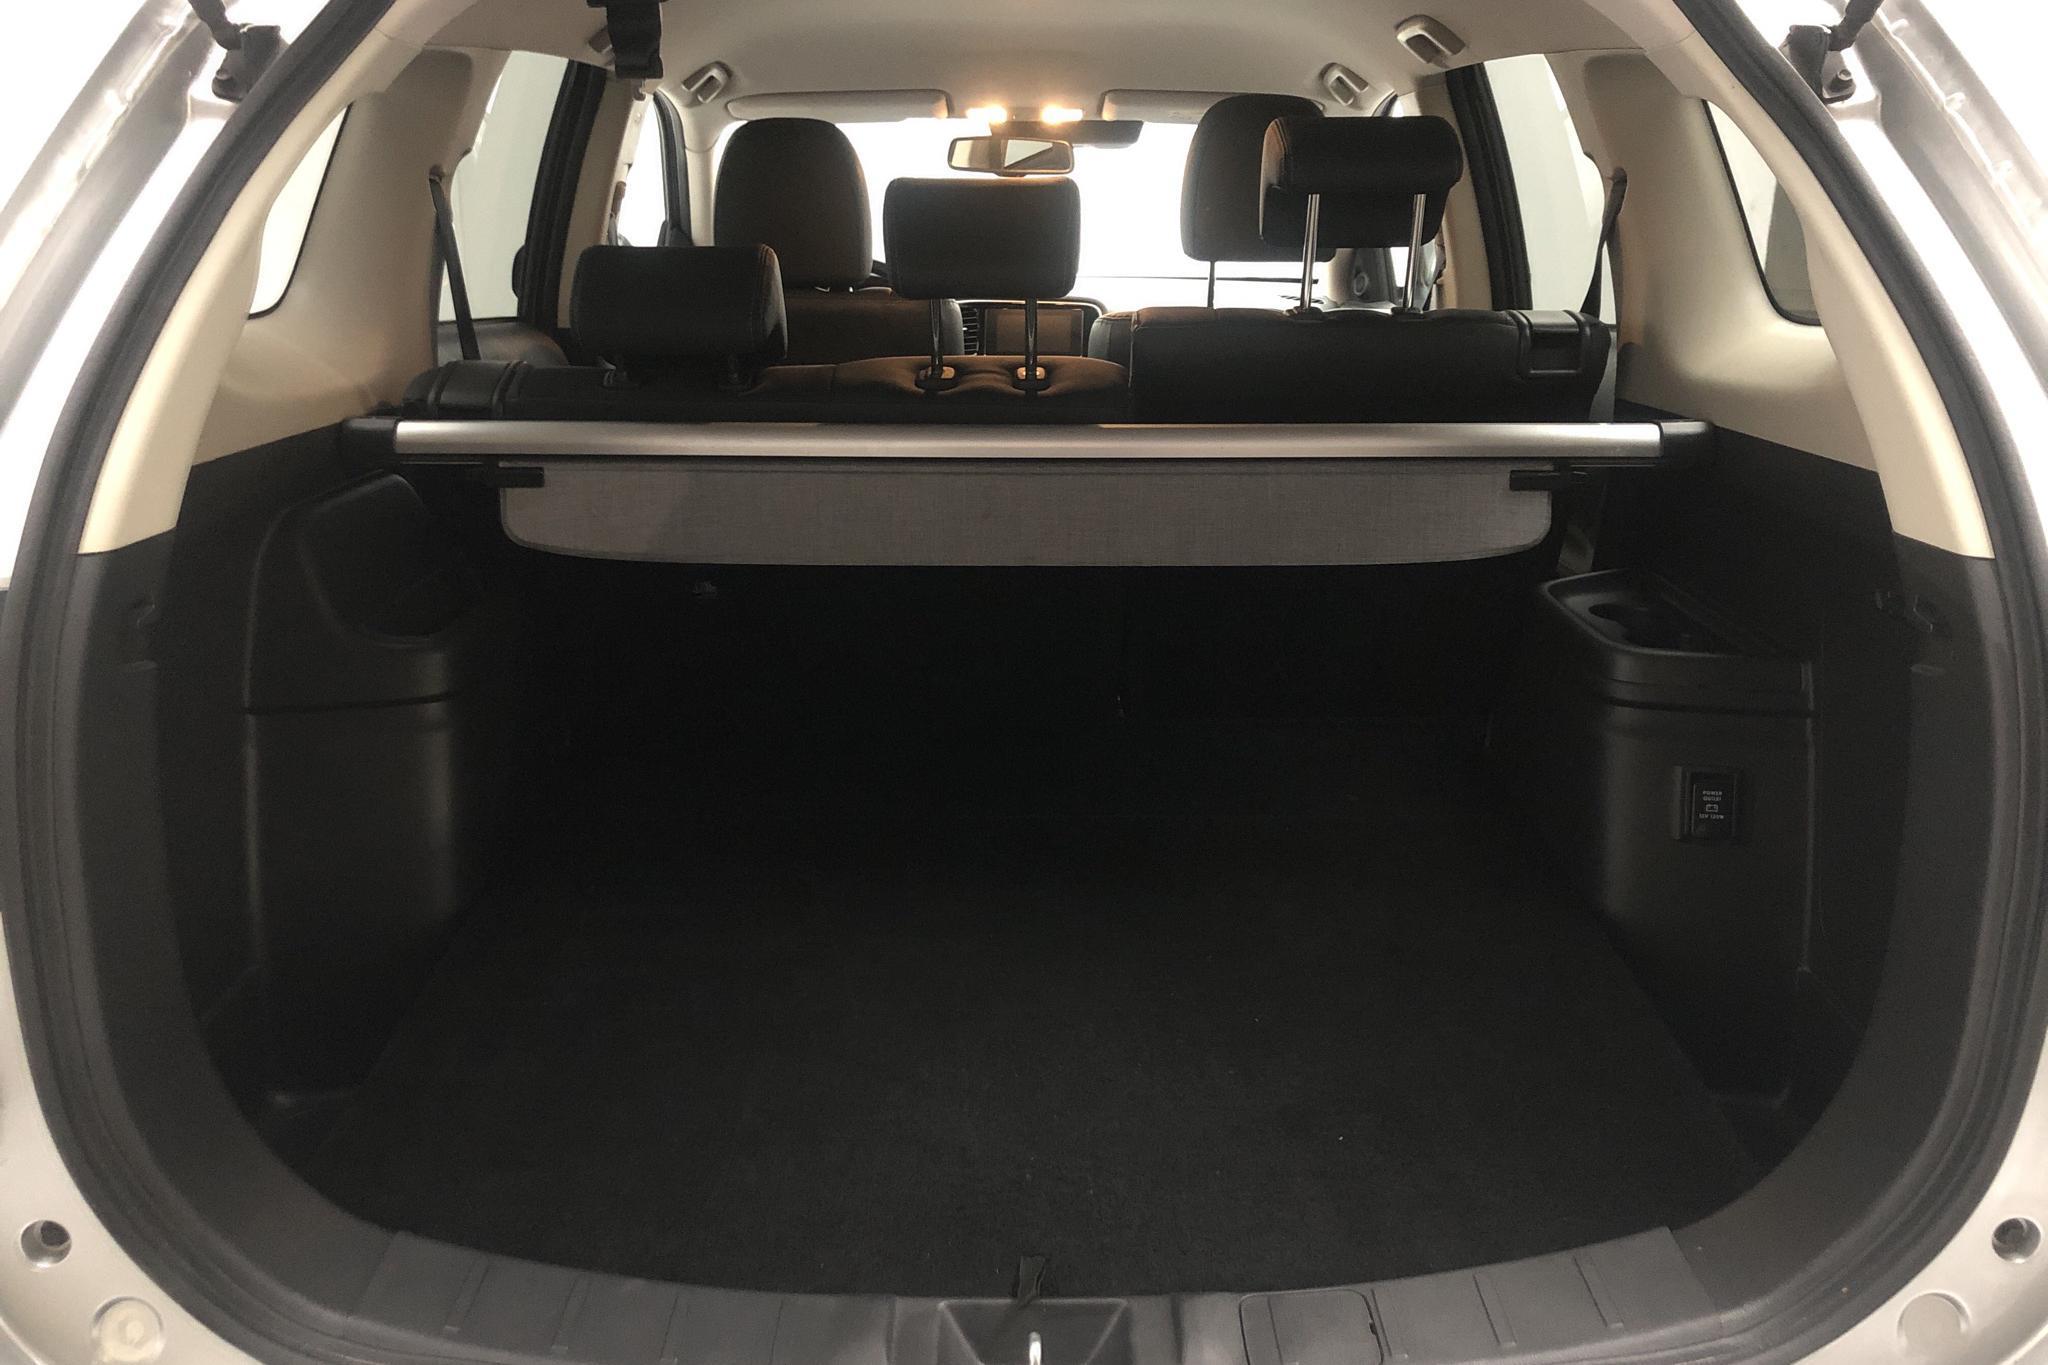 Mitsubishi Outlander 2.0 Plug-in Hybrid 4WD (121hk) - 3 658 mil - Automat - silver - 2018